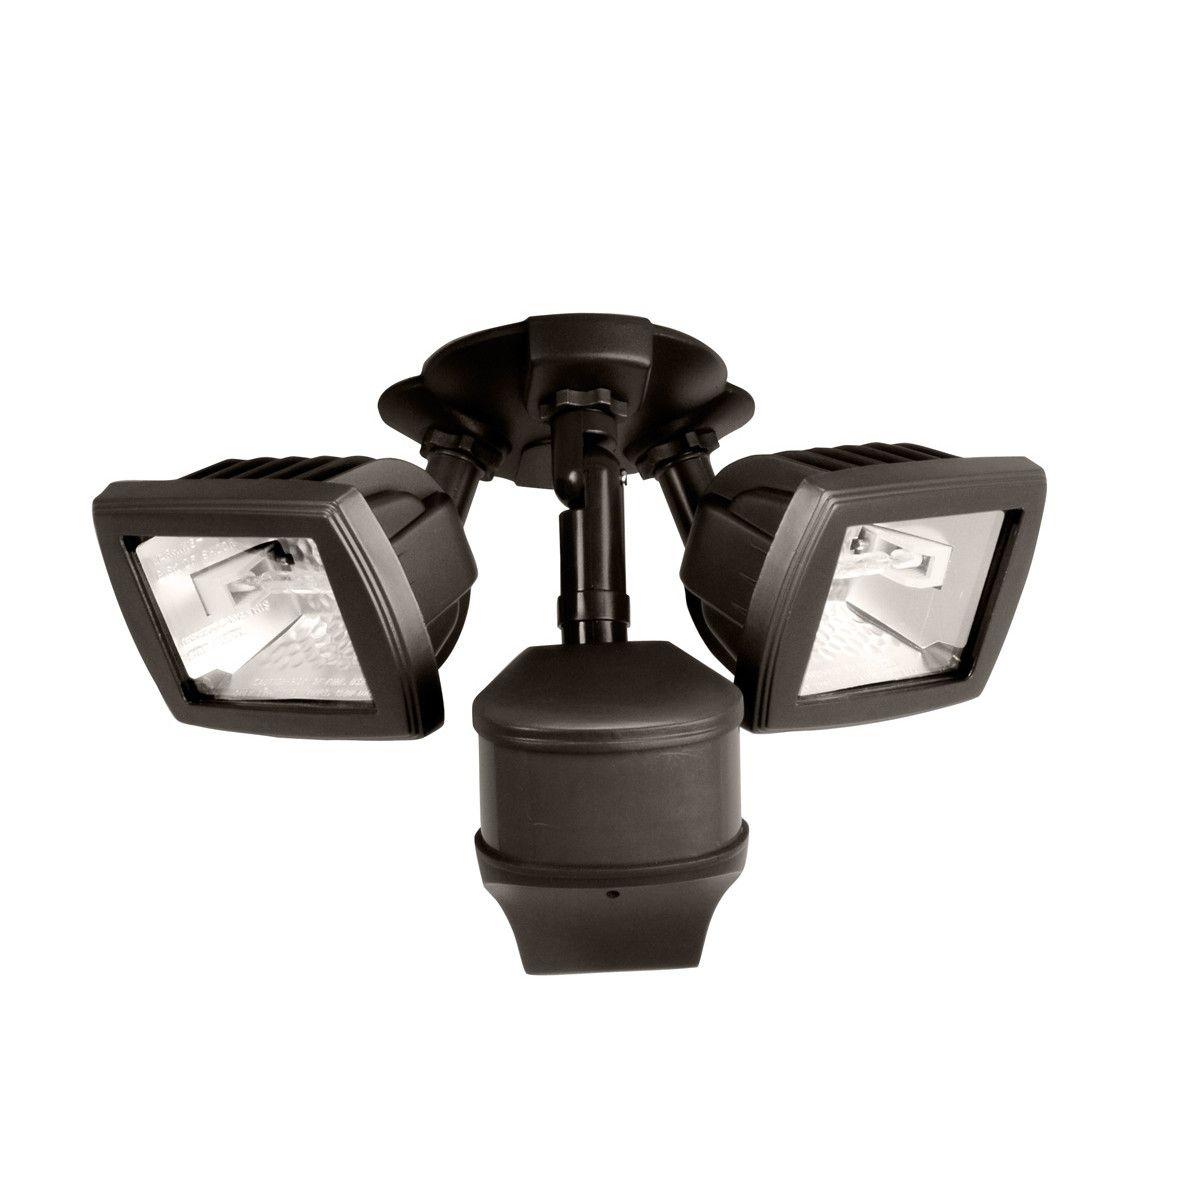 Motion Sensor Porch Light You Ll Love In 2021 Visualhunt